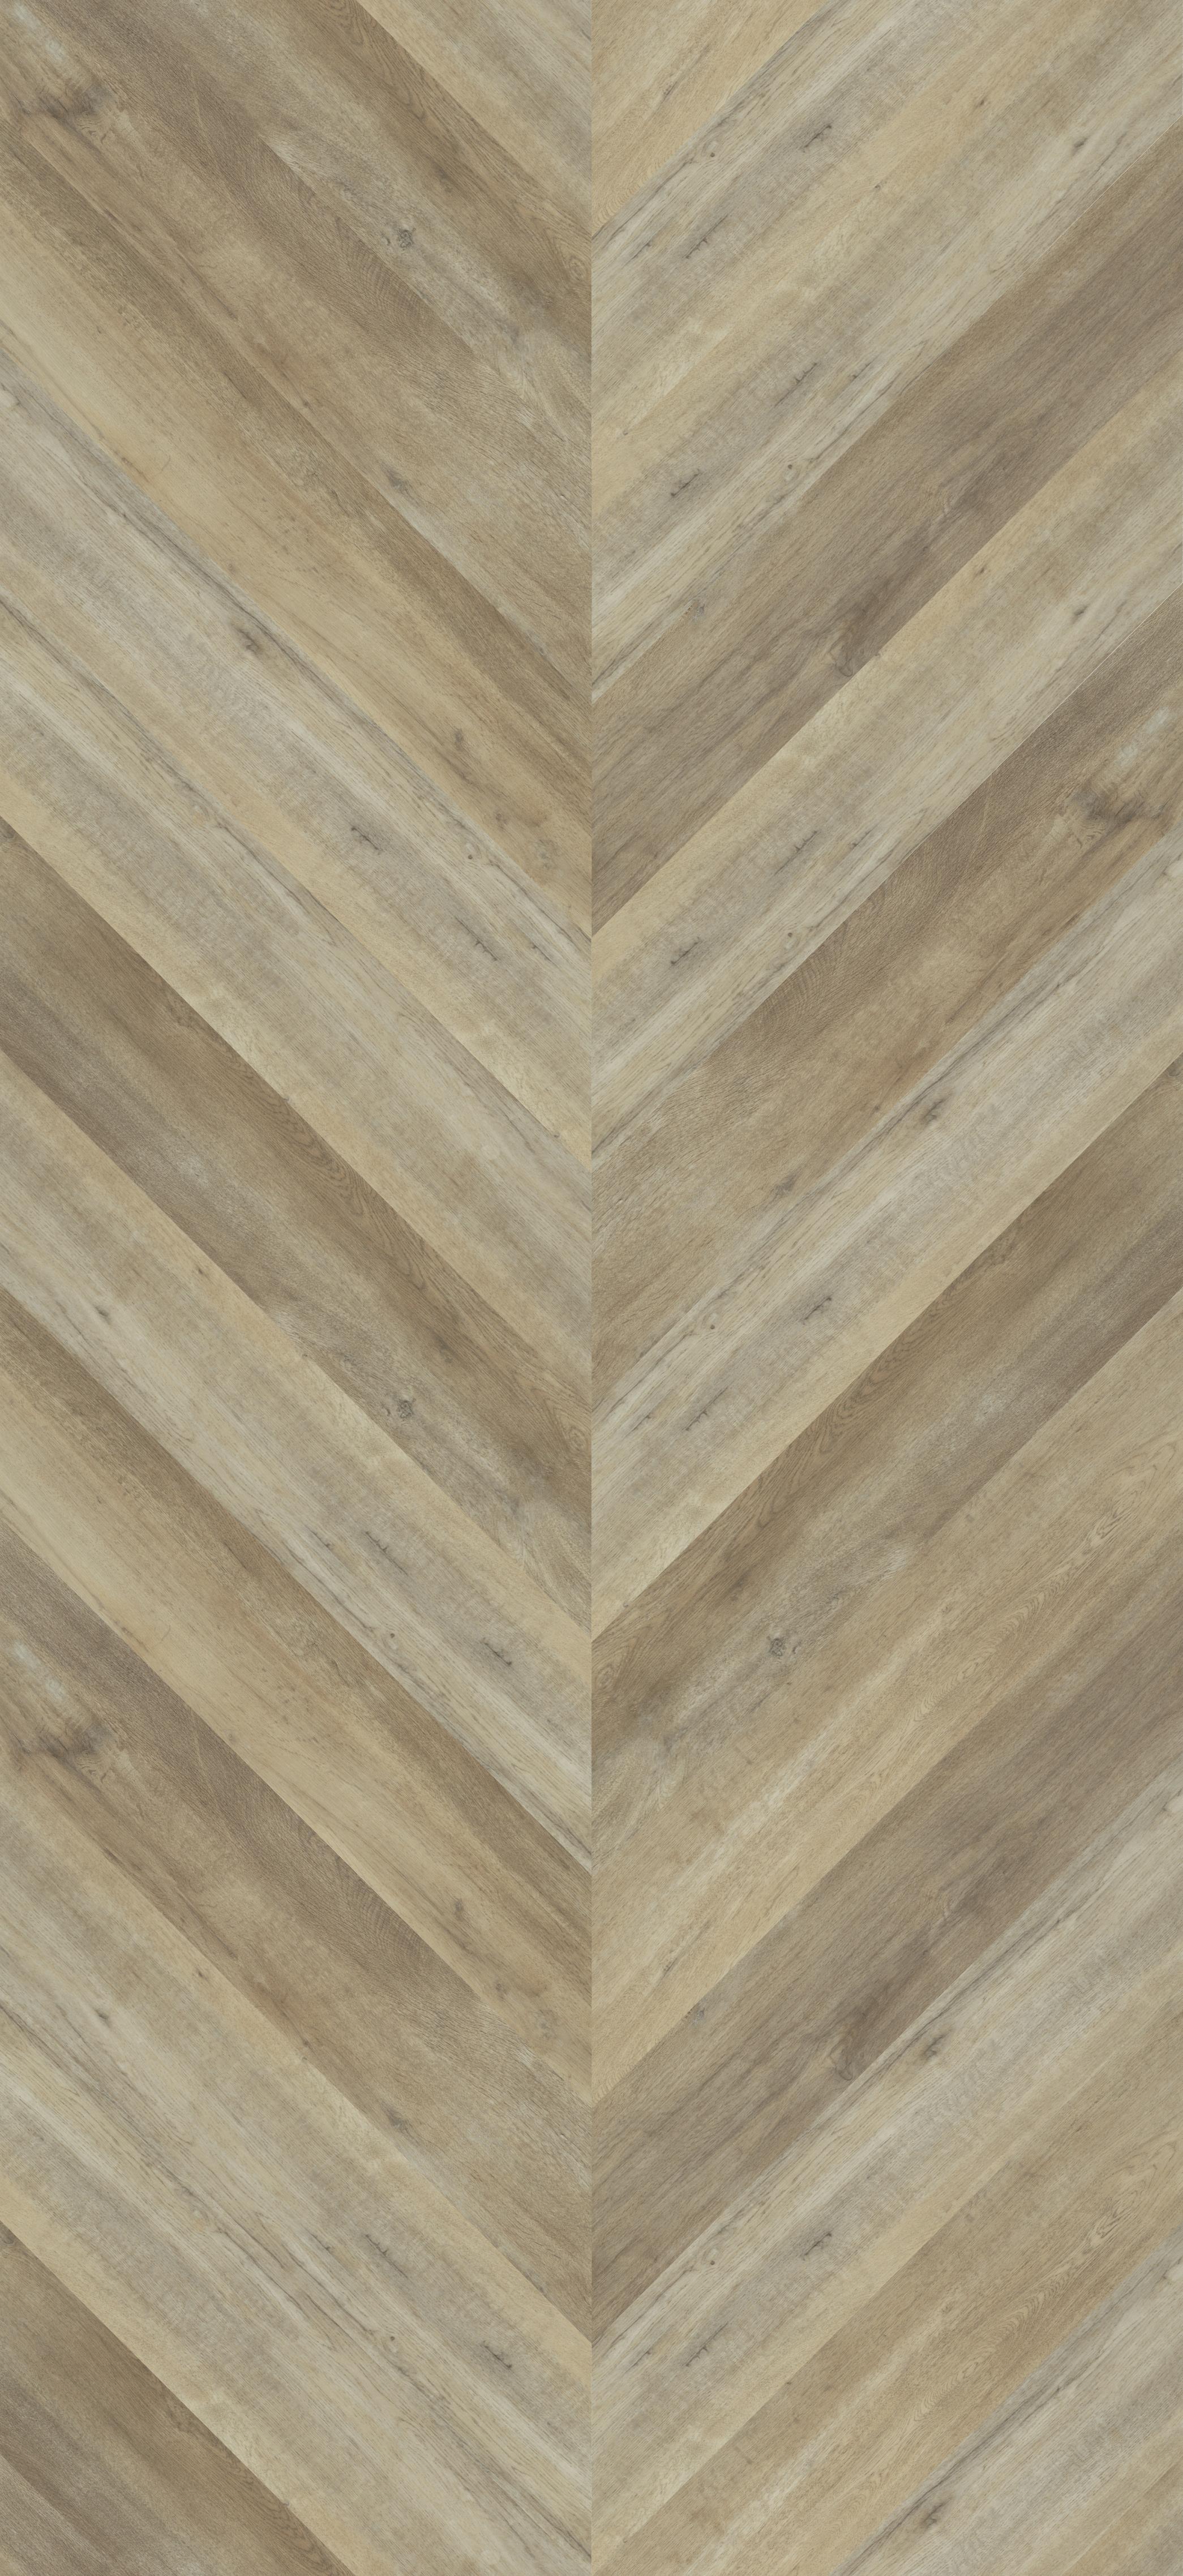 Luxury Vinyl Wood Planks Forbo Flooring Systems Australia